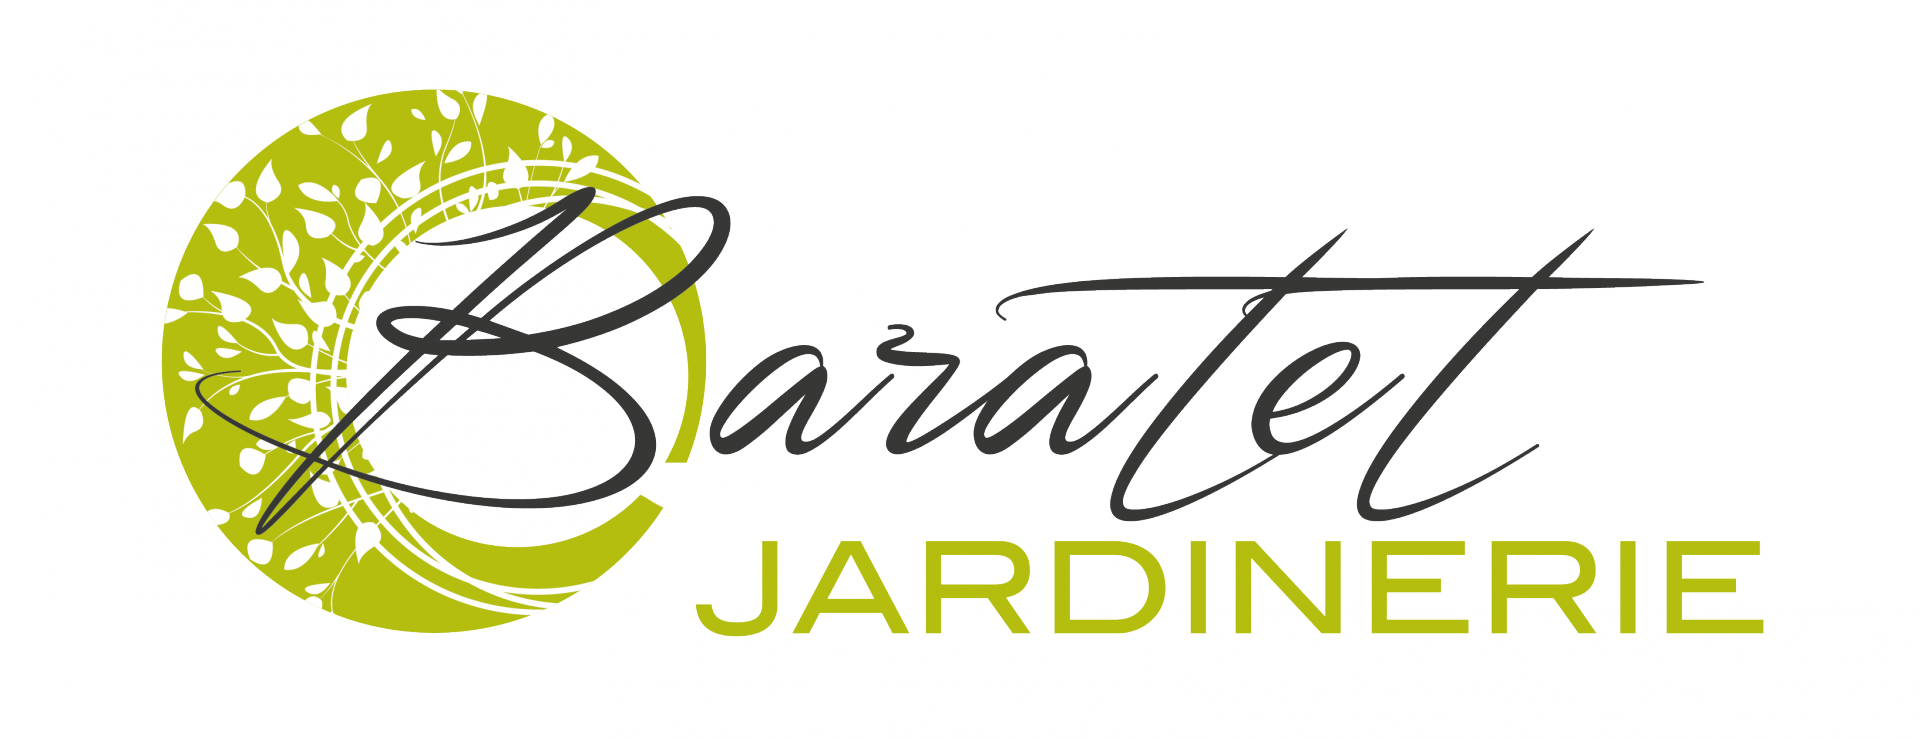 Logo Jardinerie Baratet